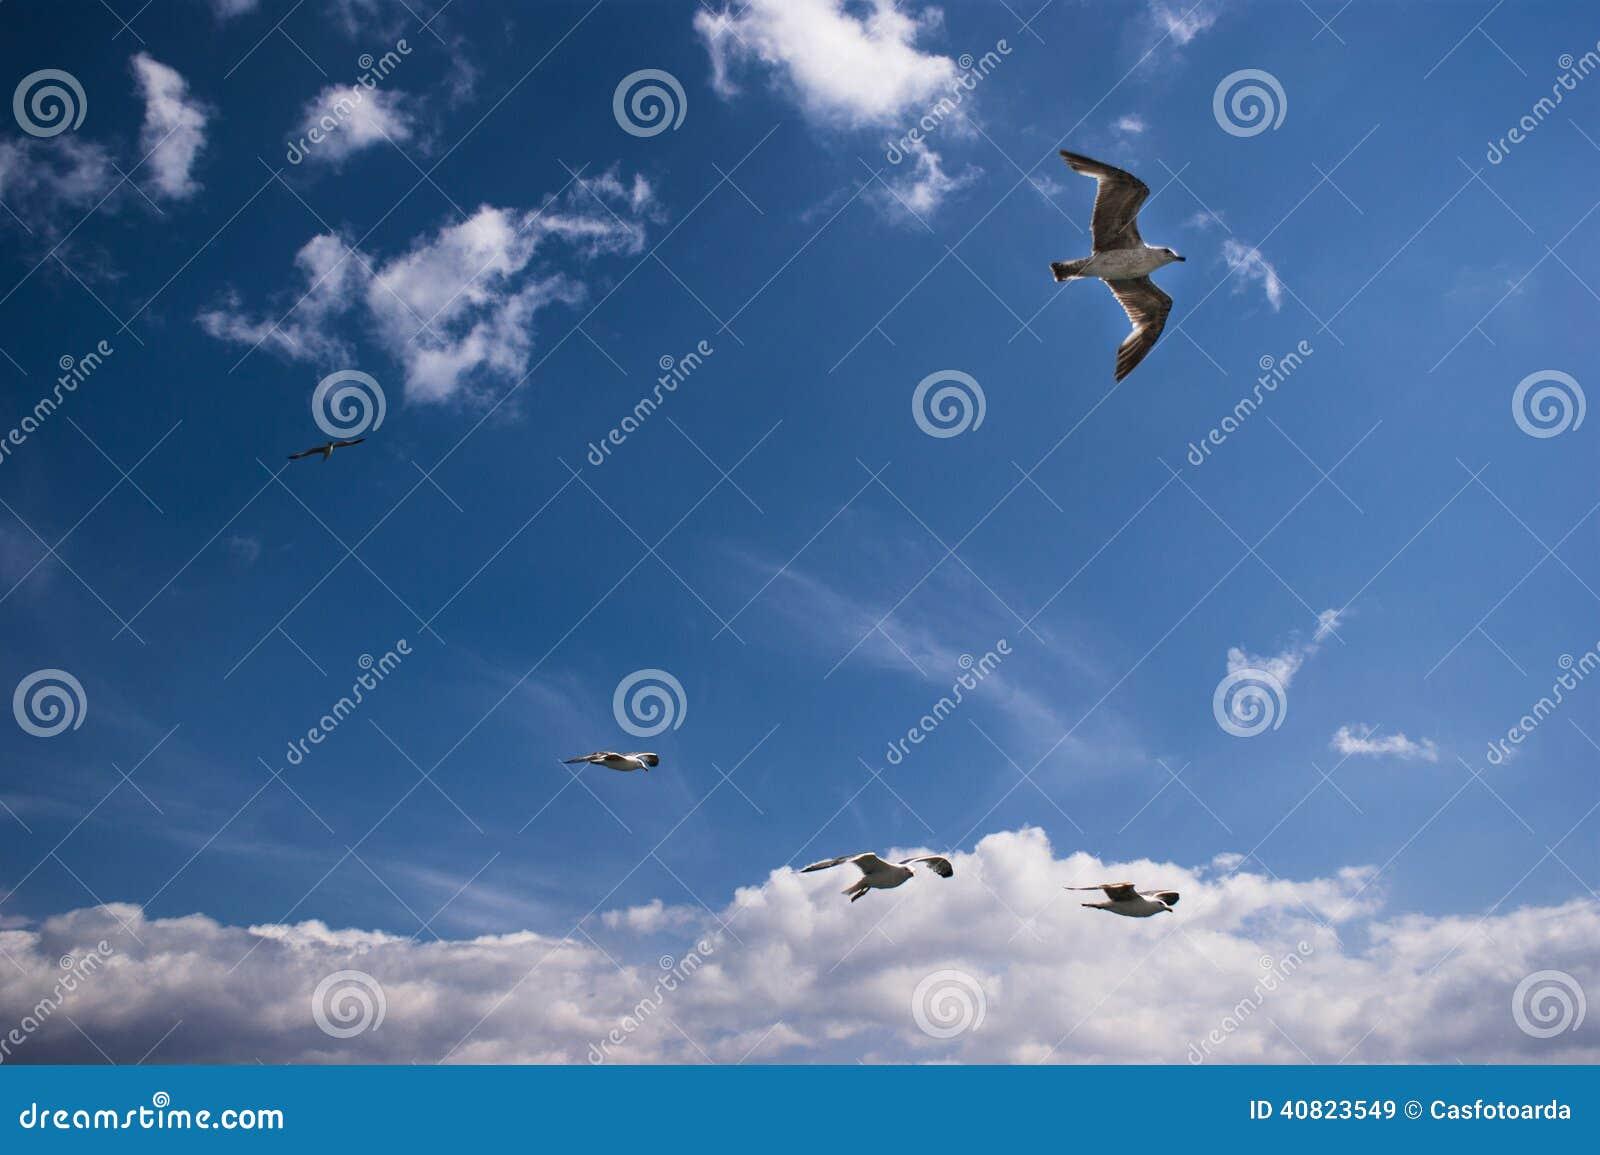 Seagulls are on sky